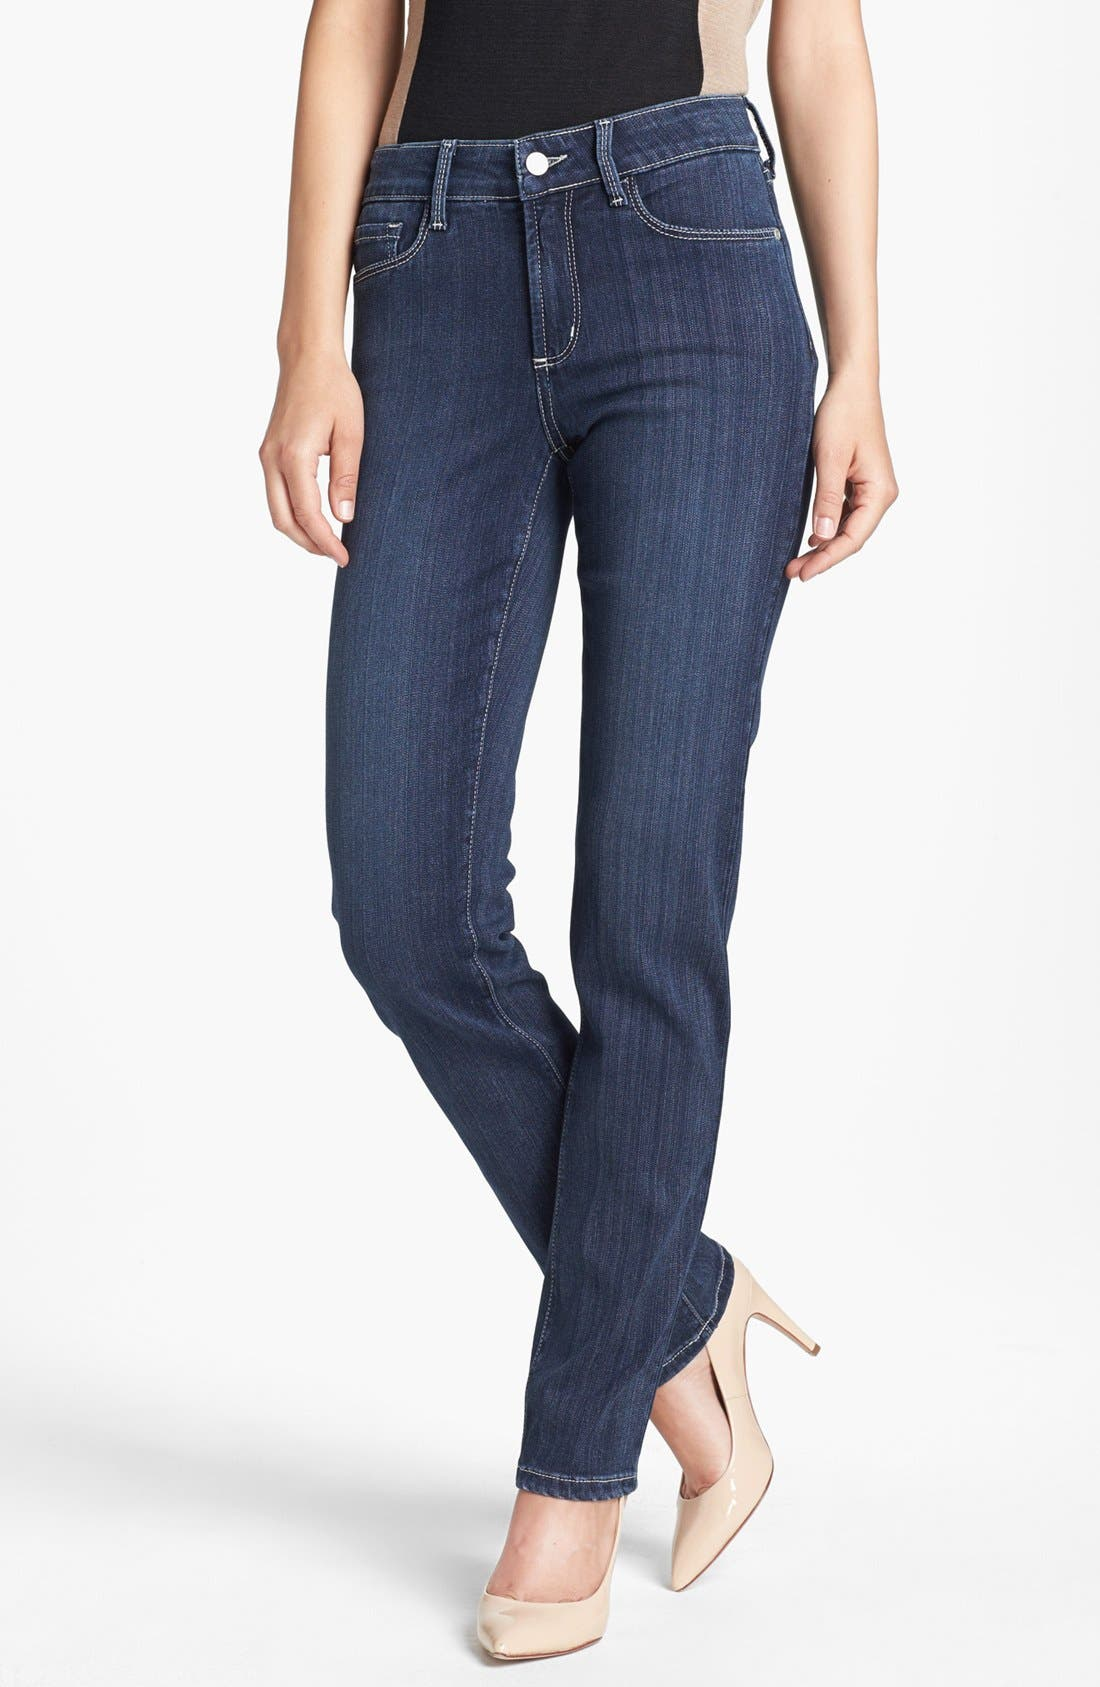 Main Image - NYDJ 'Sheri' Stretch Skinny Jeans (Regular & Petite)